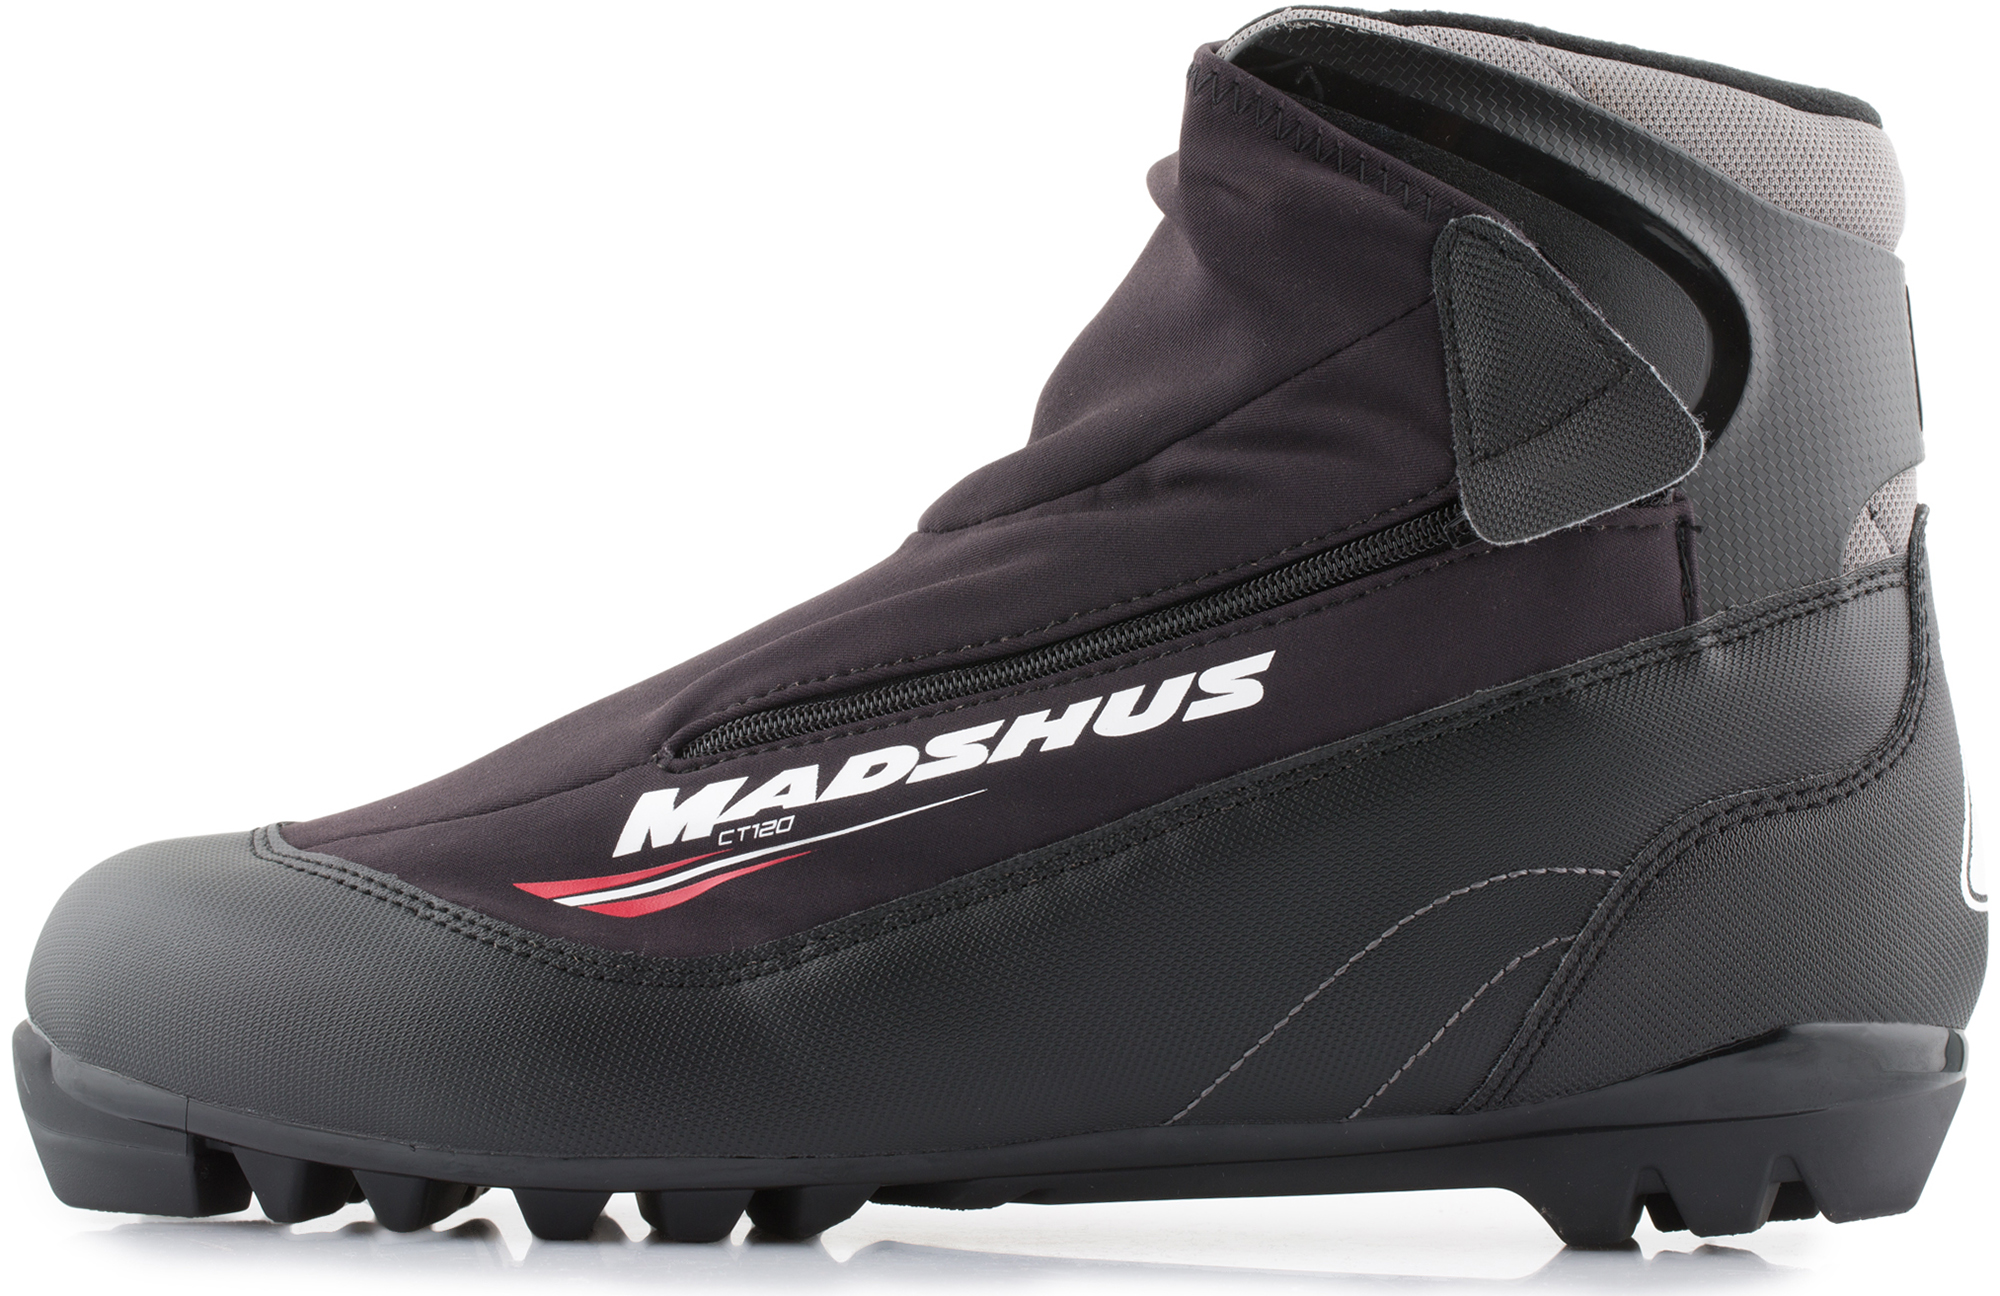 цена на Madshus Ботинки для беговых лыж Madshus Ct120